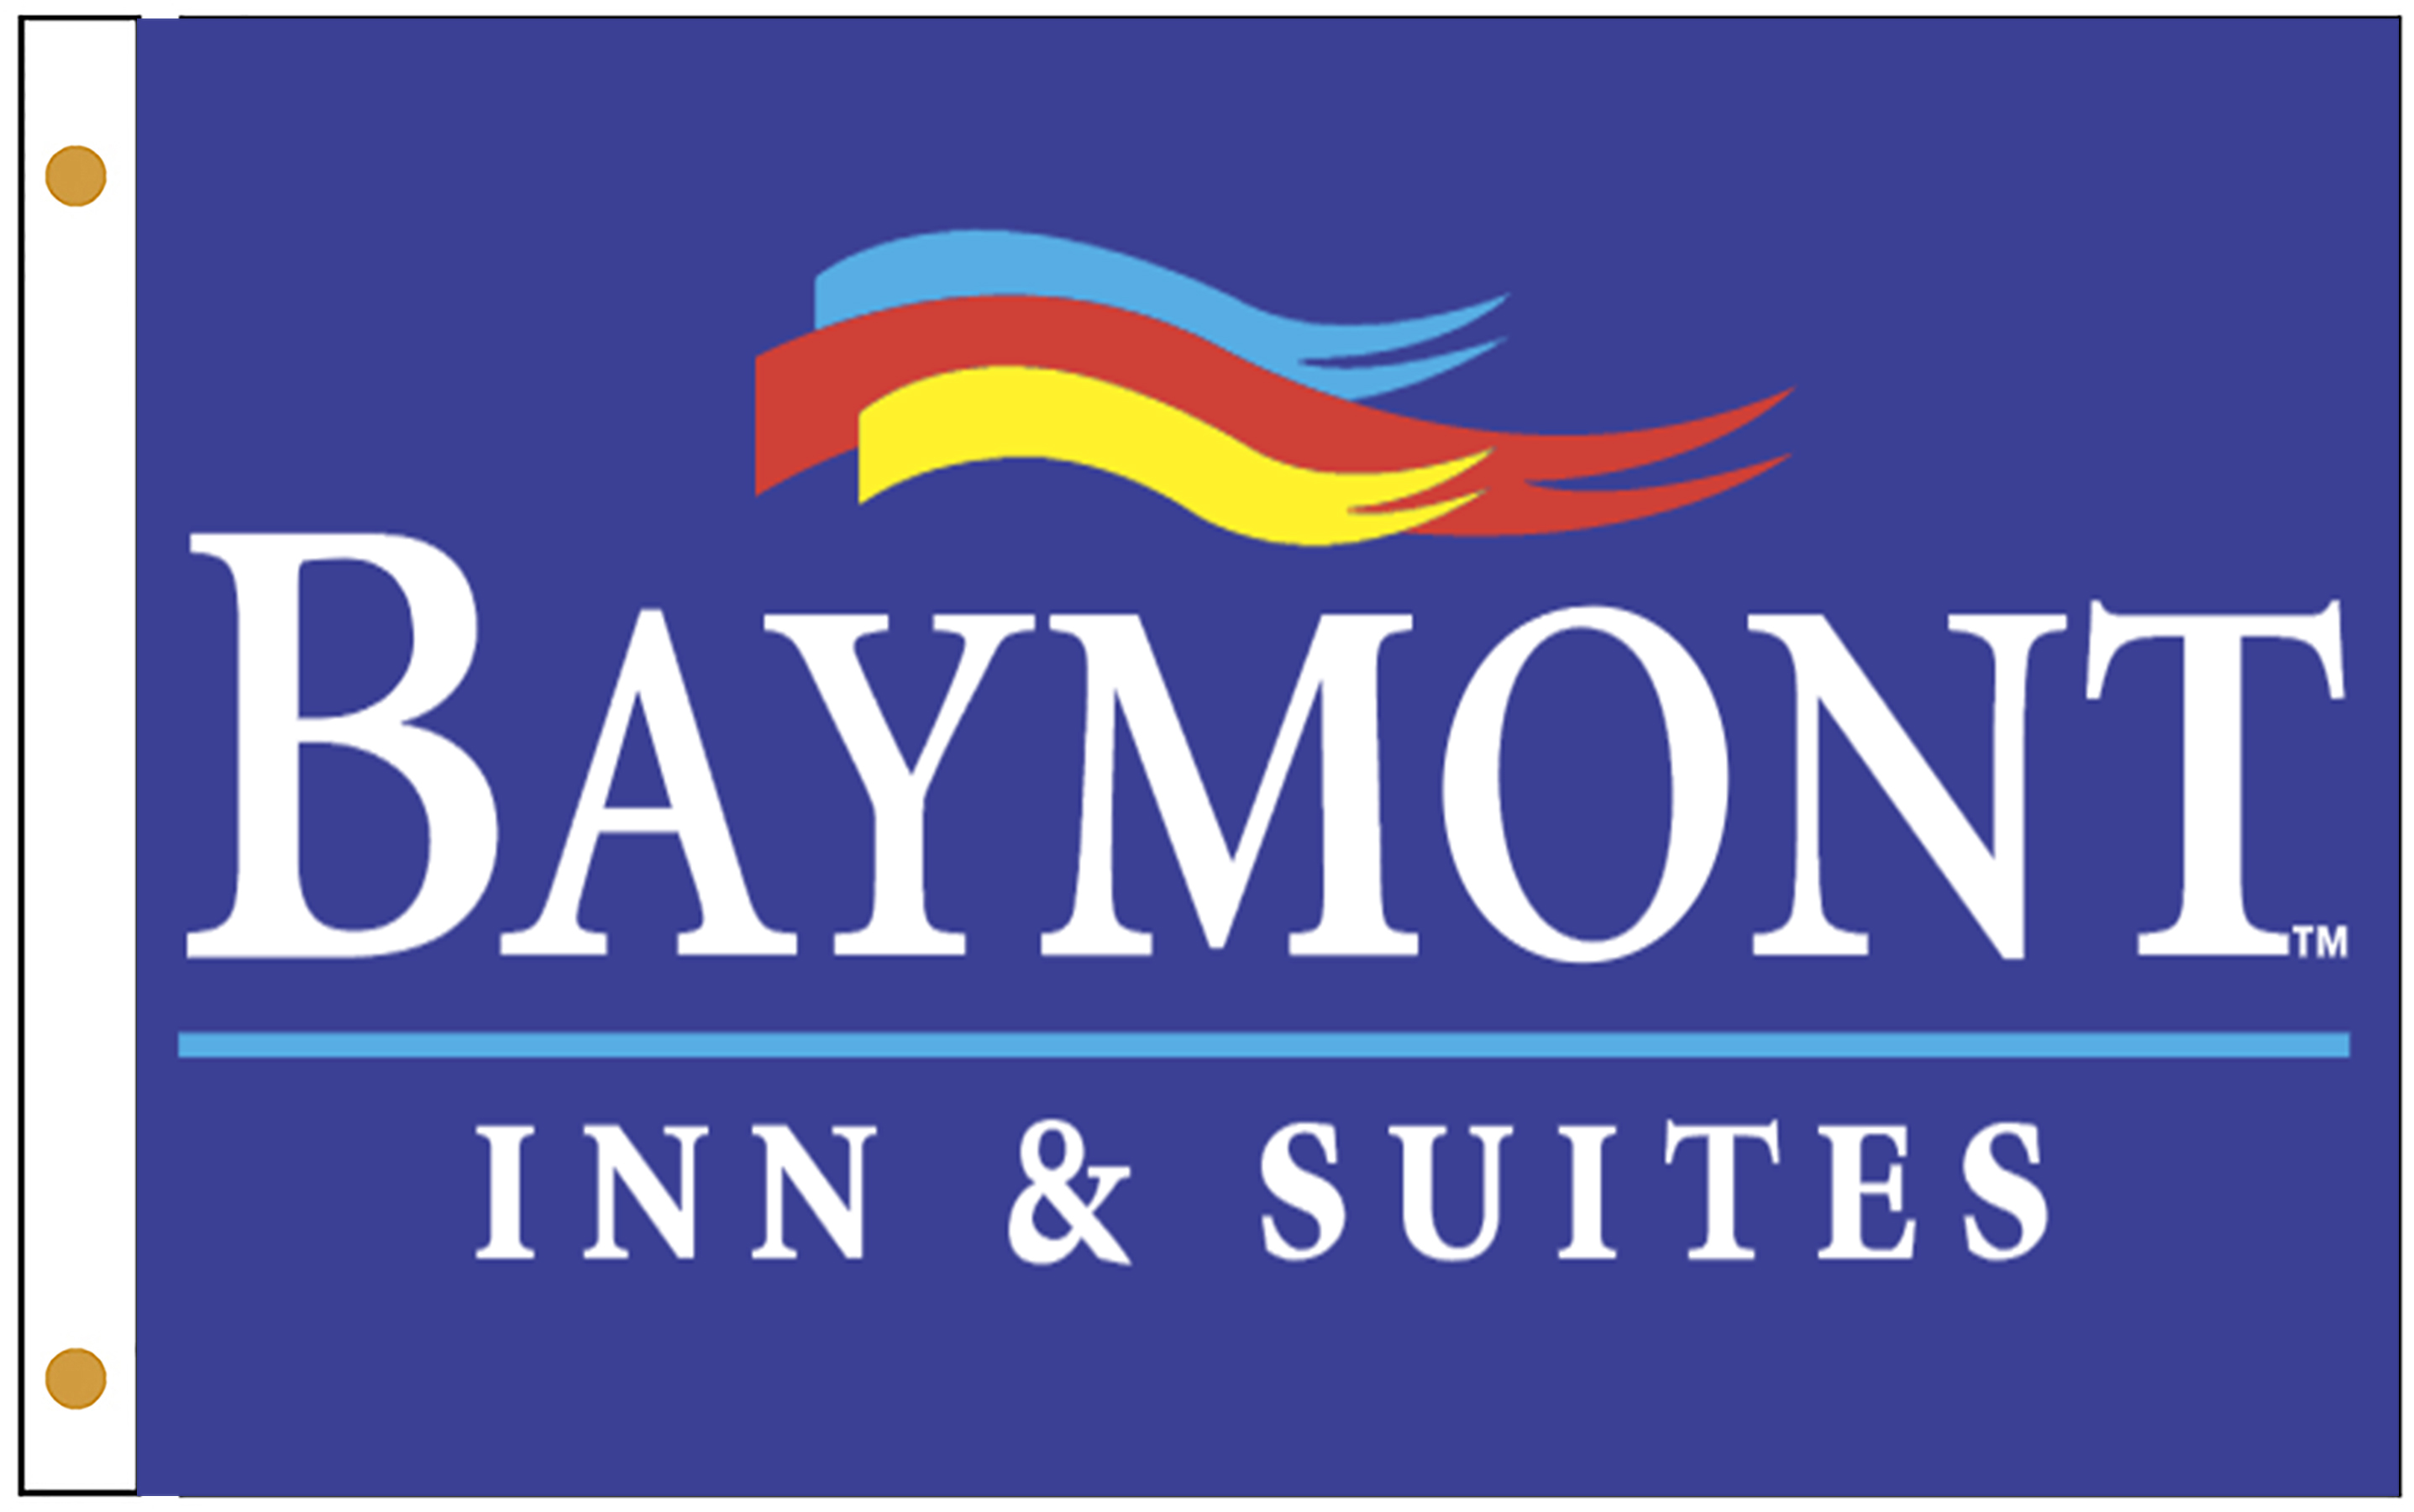 Baymont Hotel Flags